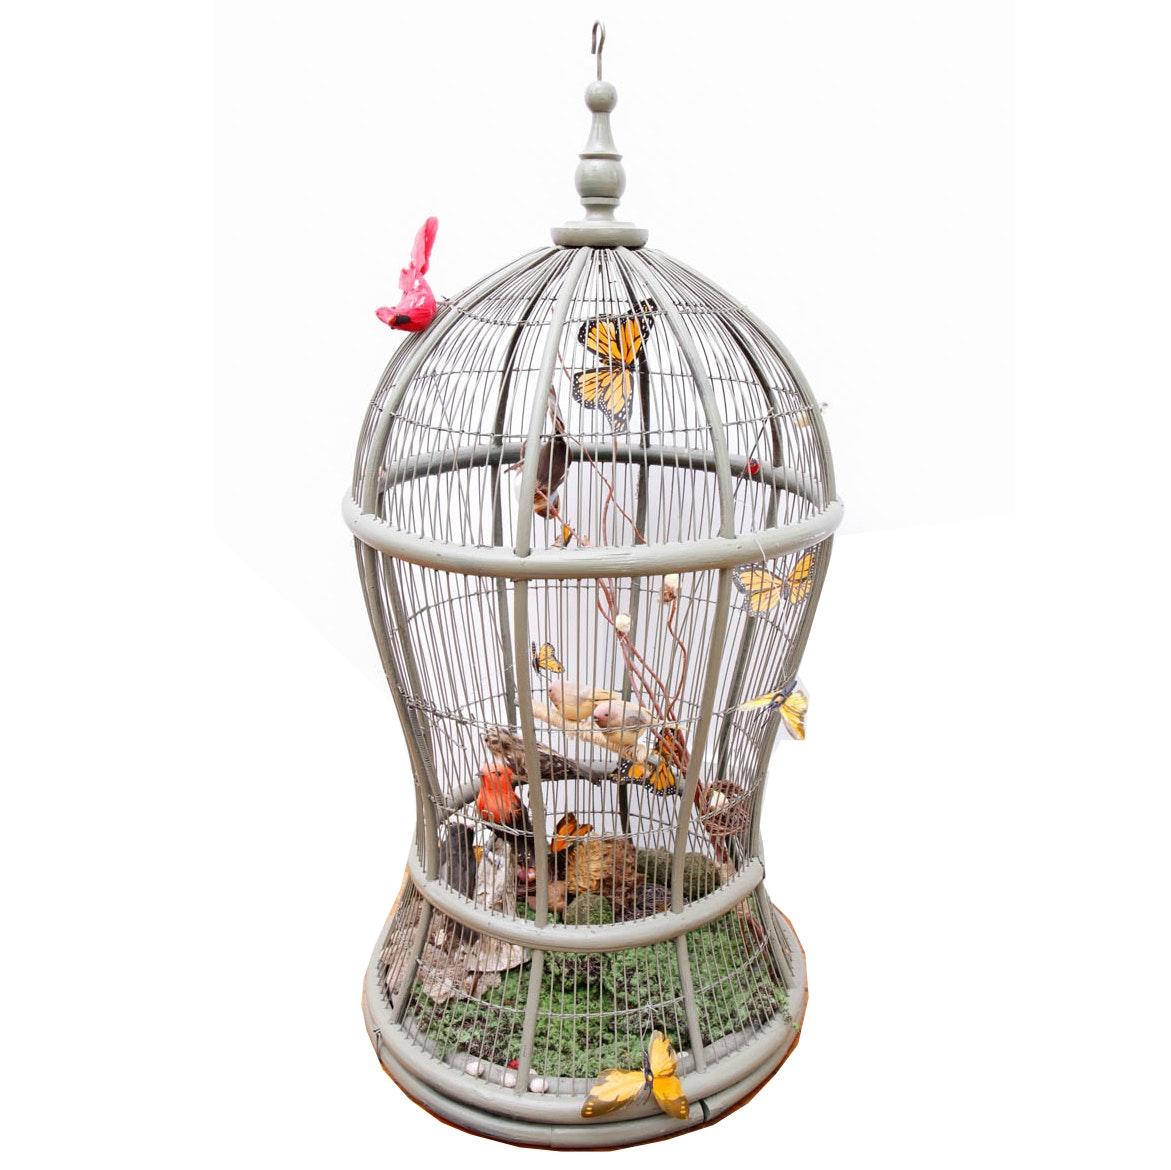 Decorative Metal Birdcage With Birds and Butterflies